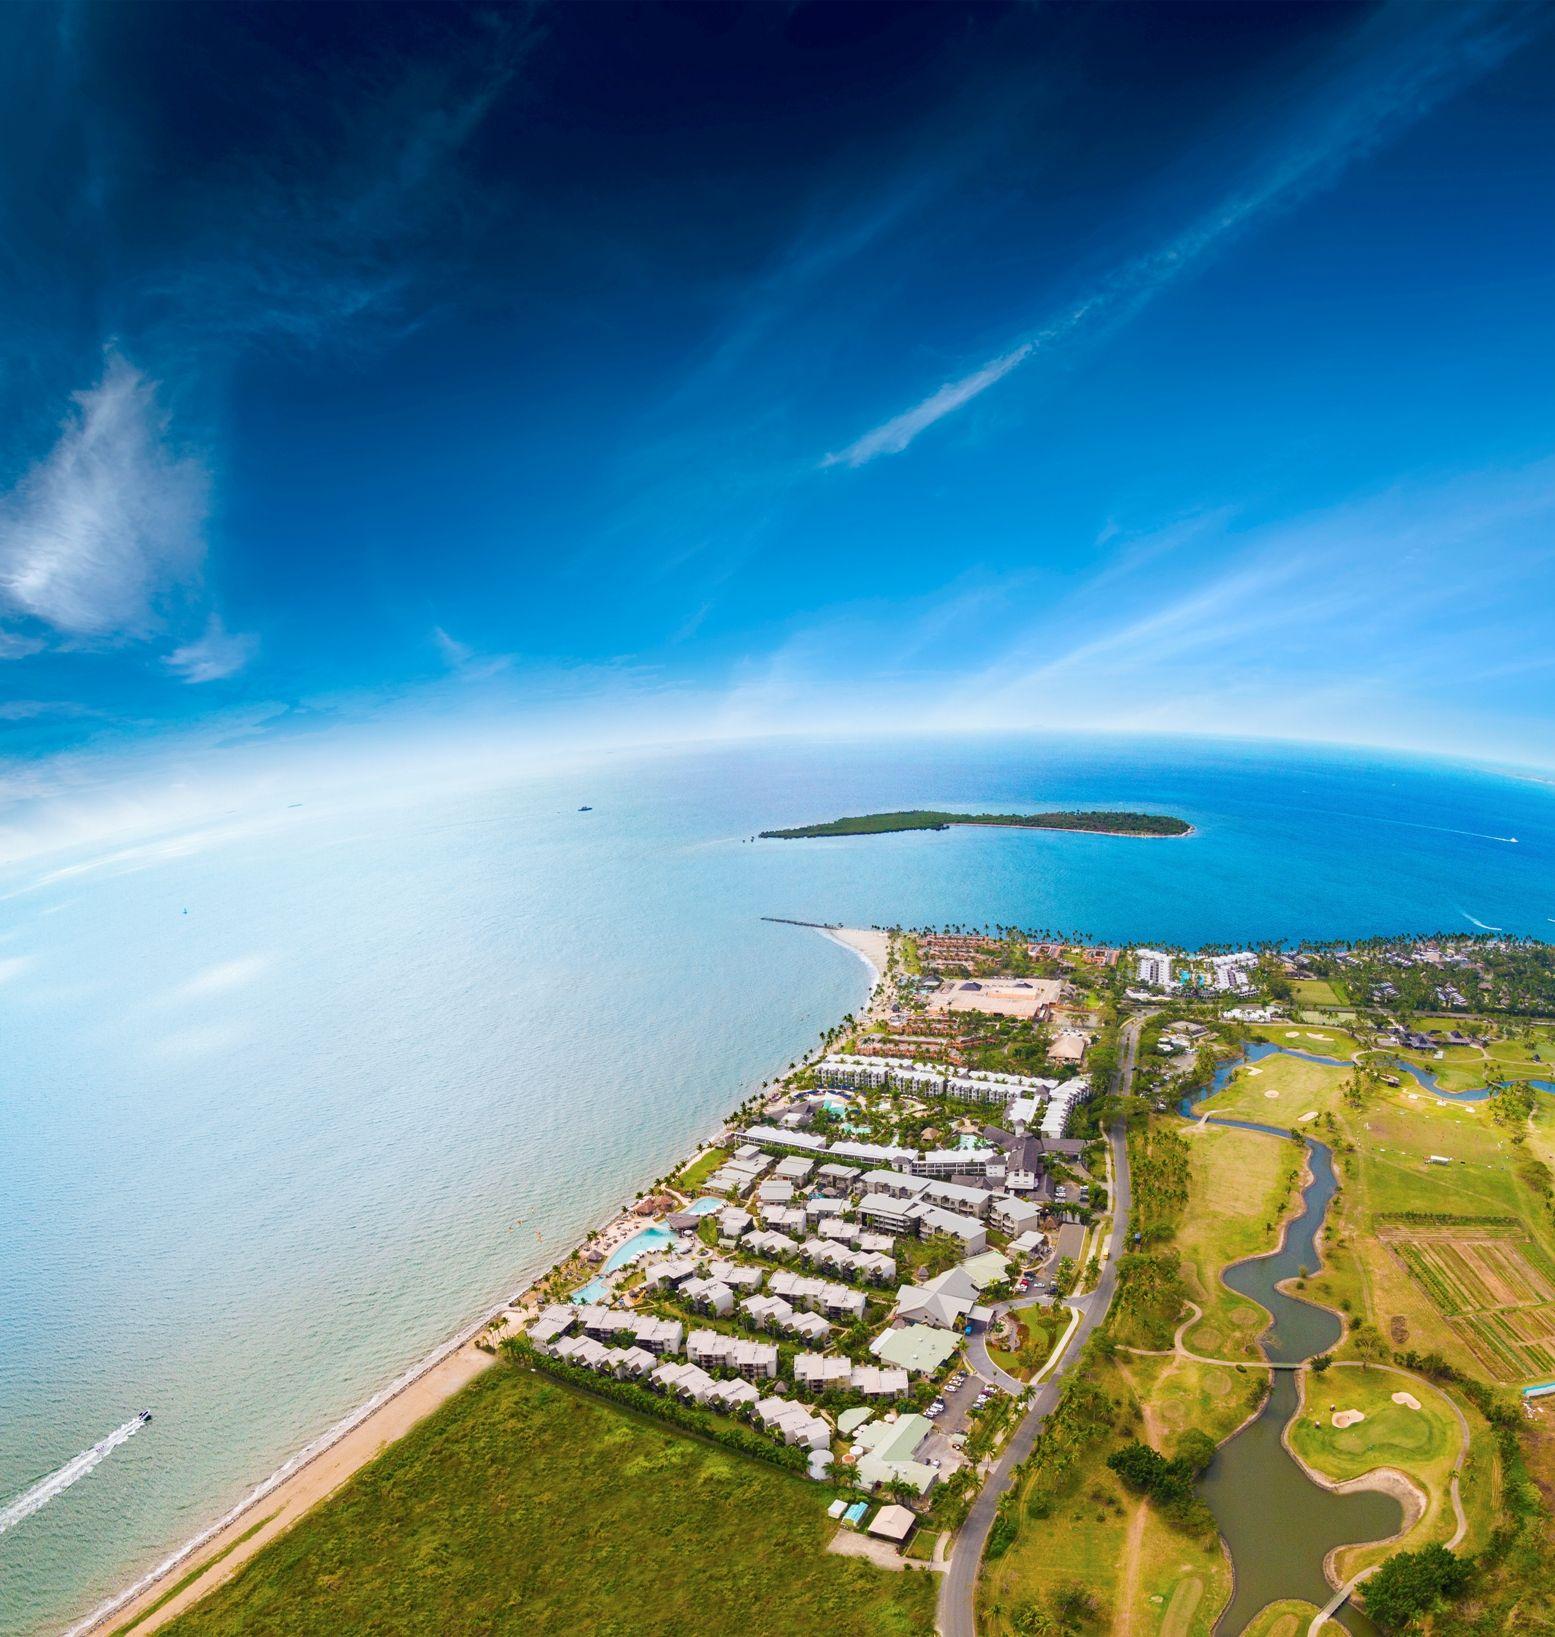 Fiji Beaches: Wyndham Resort Denarau Island, Fiji From Above. What A